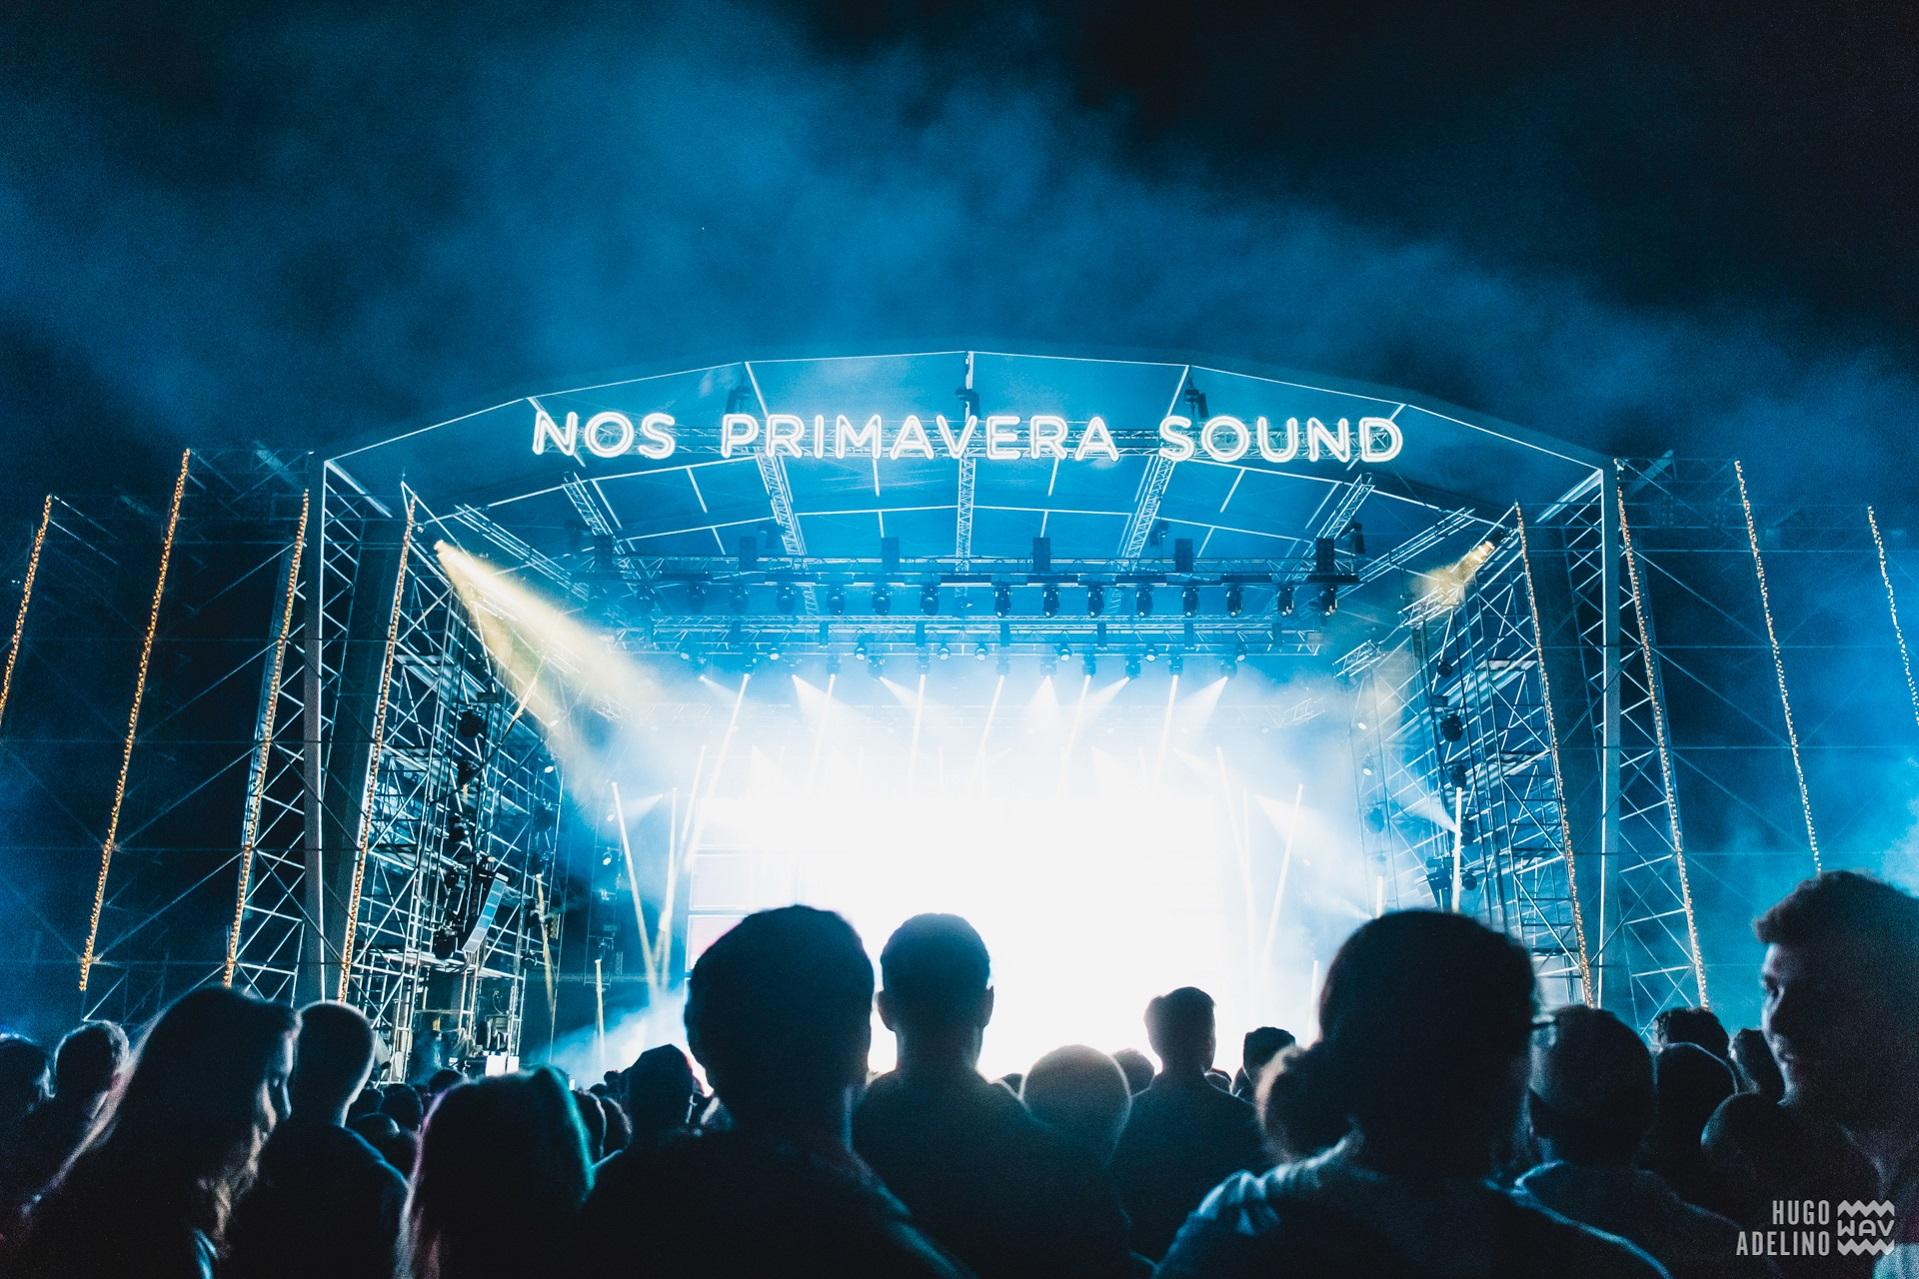 NOS Primavera Sound 2018 [7-9Jun] Fotogalerias